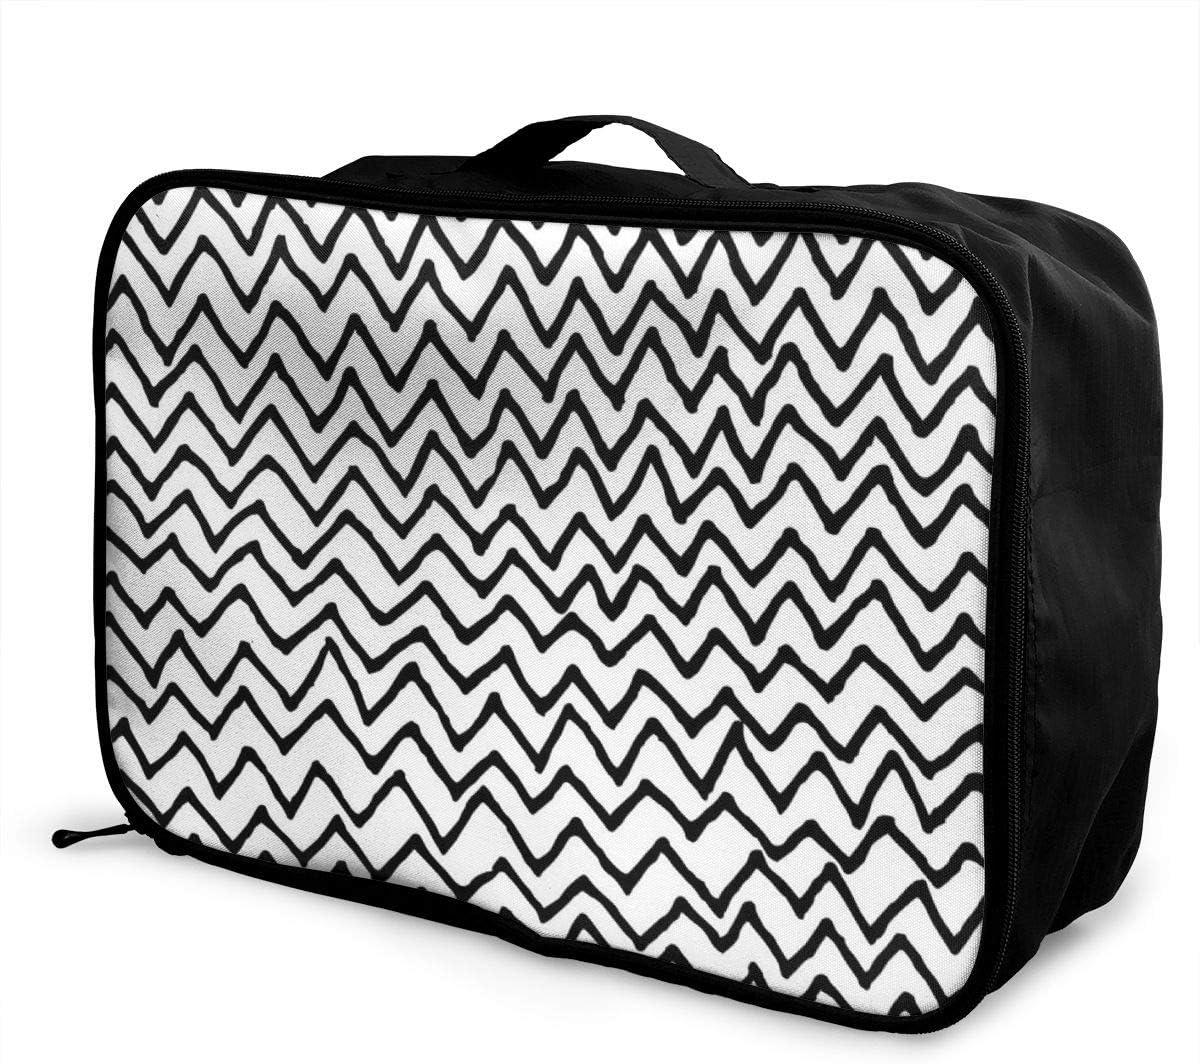 Yunshm Irregular Zigzag Pattern Customized Trolley Handbag Waterproof Unisex Large Capacity For Business Travel Storage